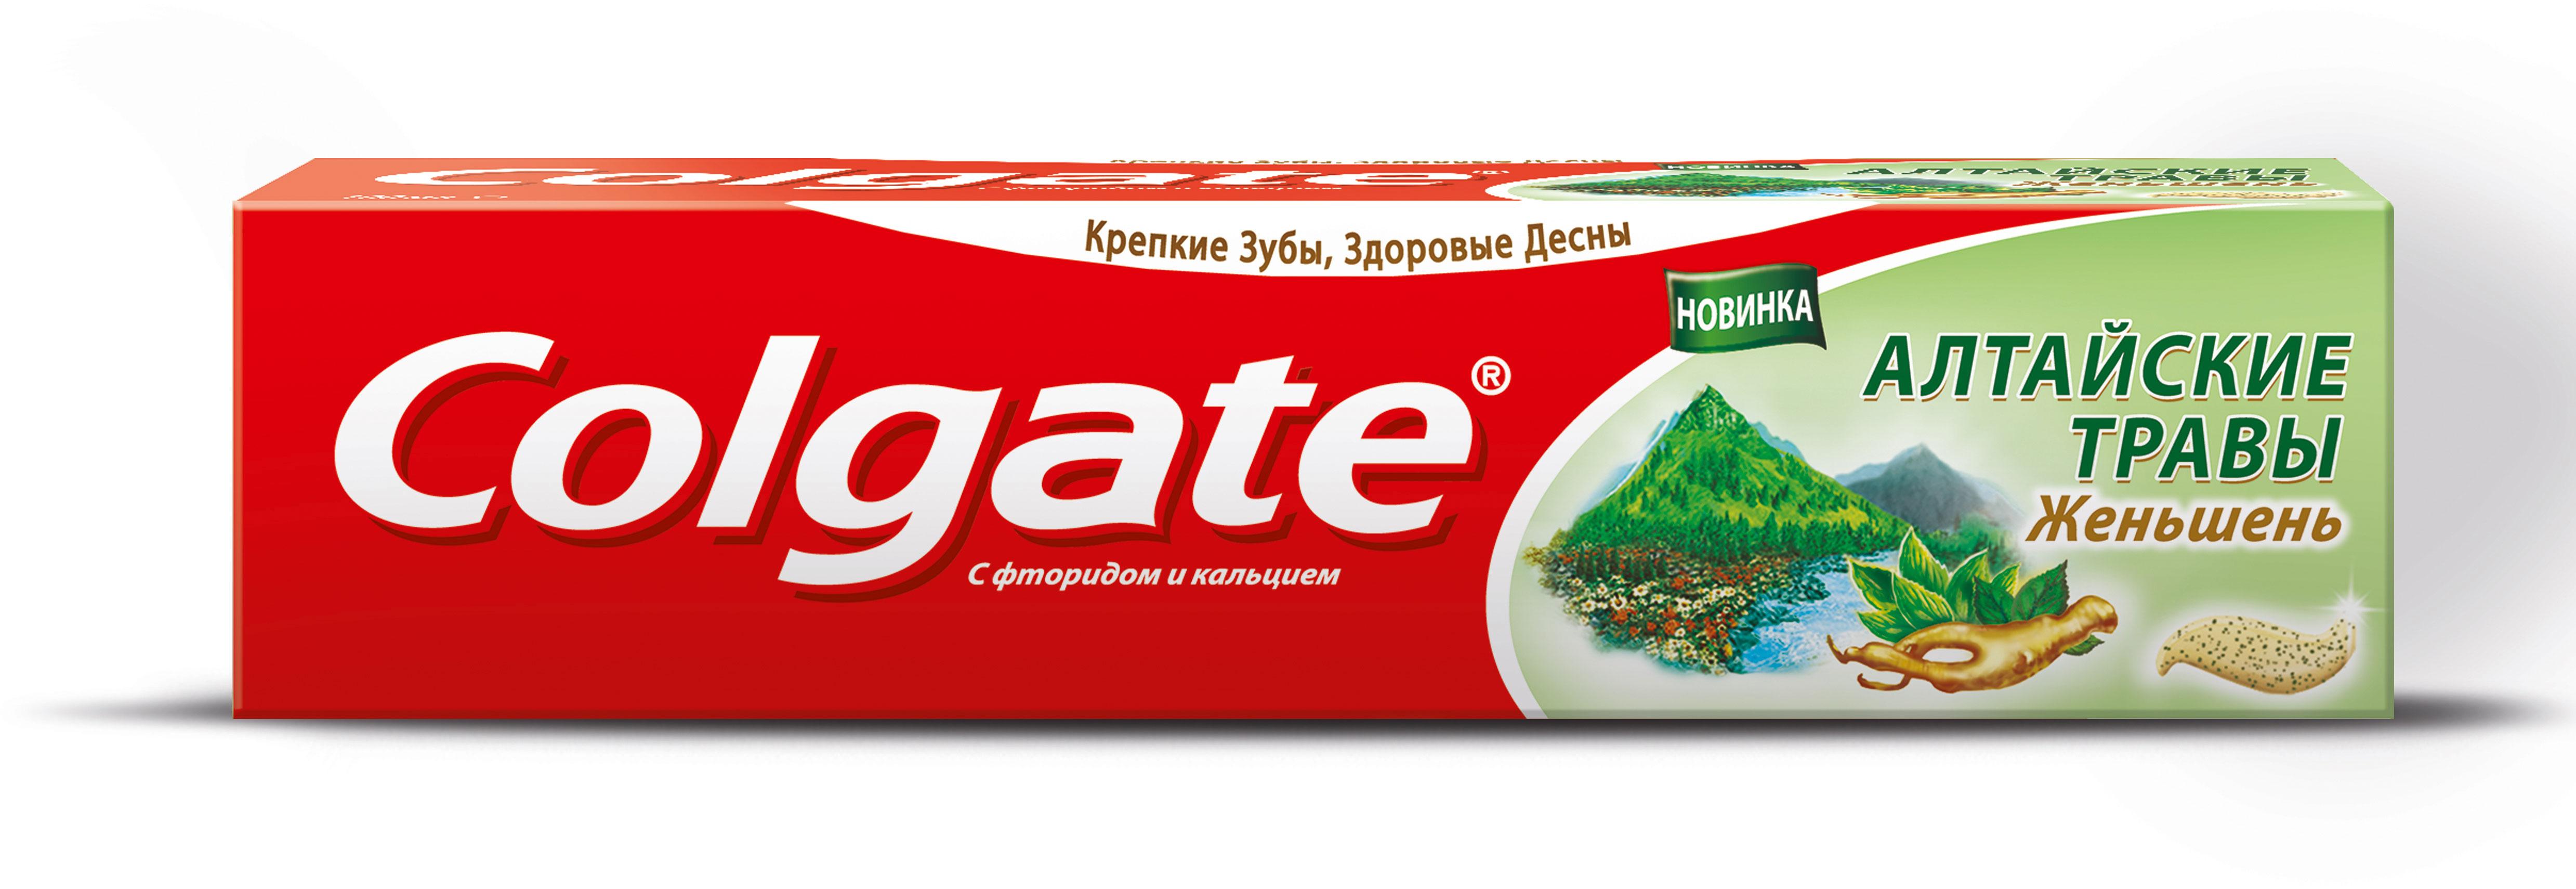 Colgate Зубная паста Алтайские Травы Женьшень 100 мл